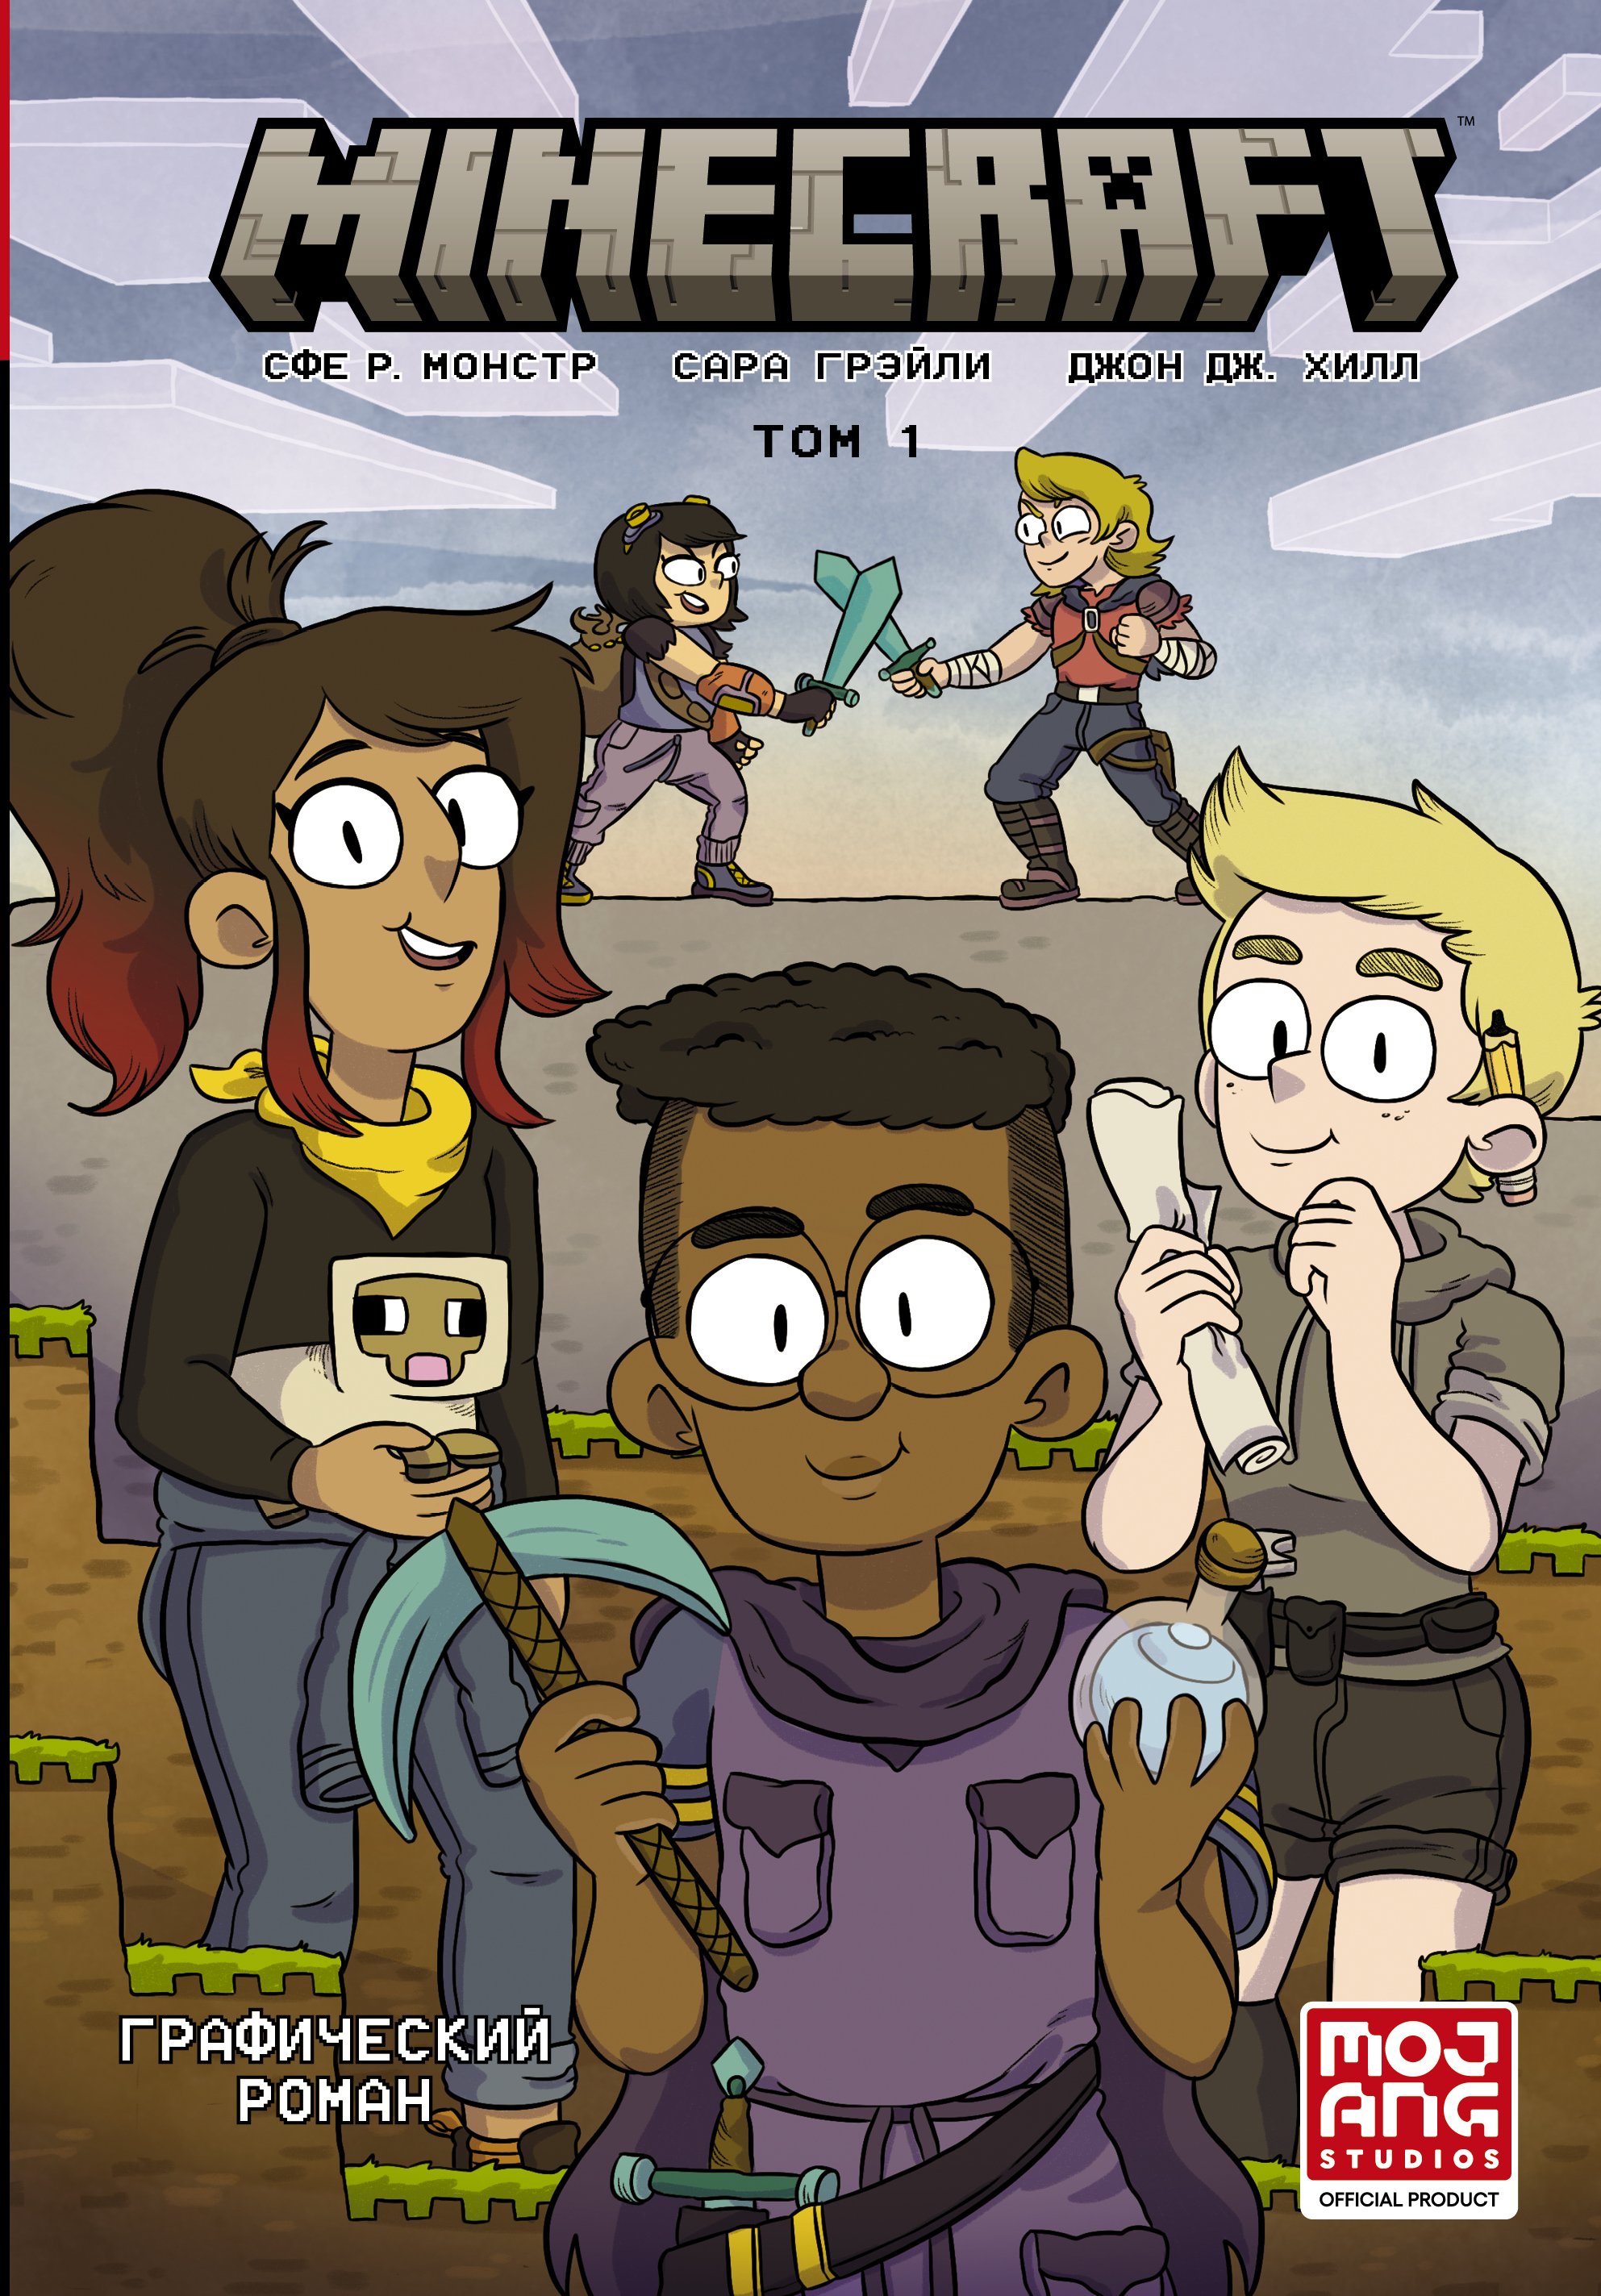 Minecraft. Том 1. Графический роман ( Монстр Сфе Р., Грэйли Сара, Хилл Джон Дж.  )